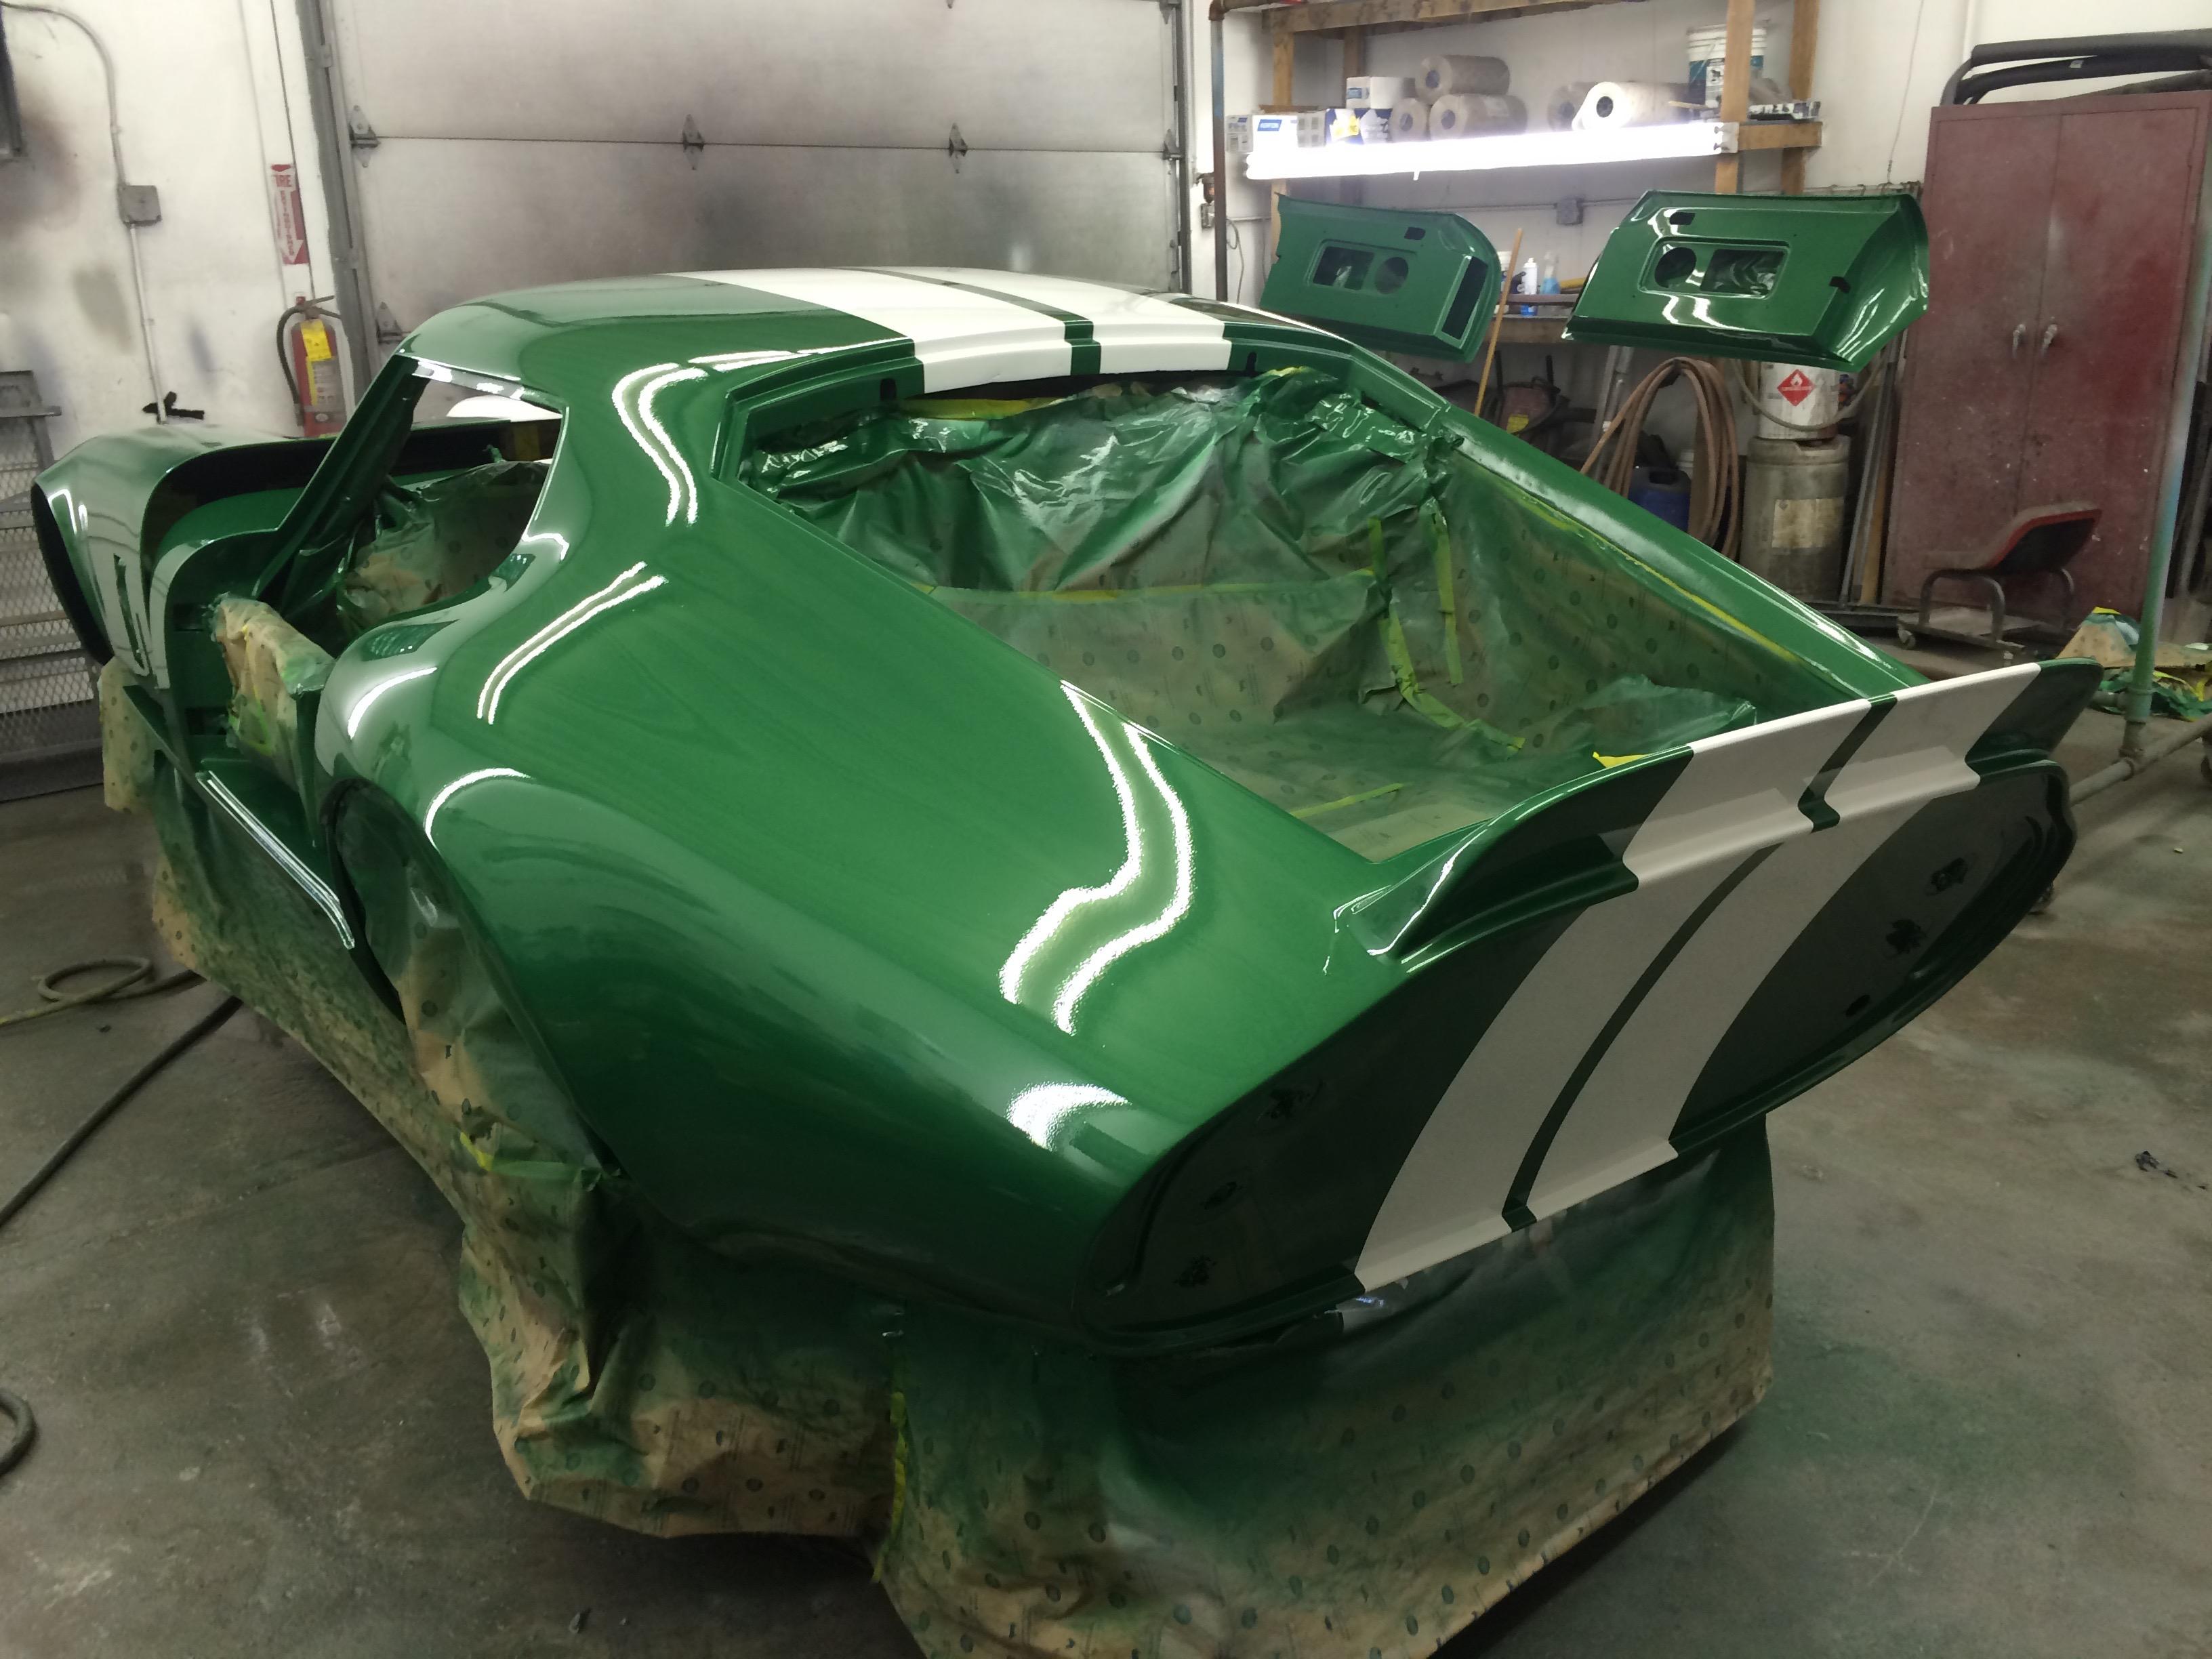 Daytona Racecar Restoration